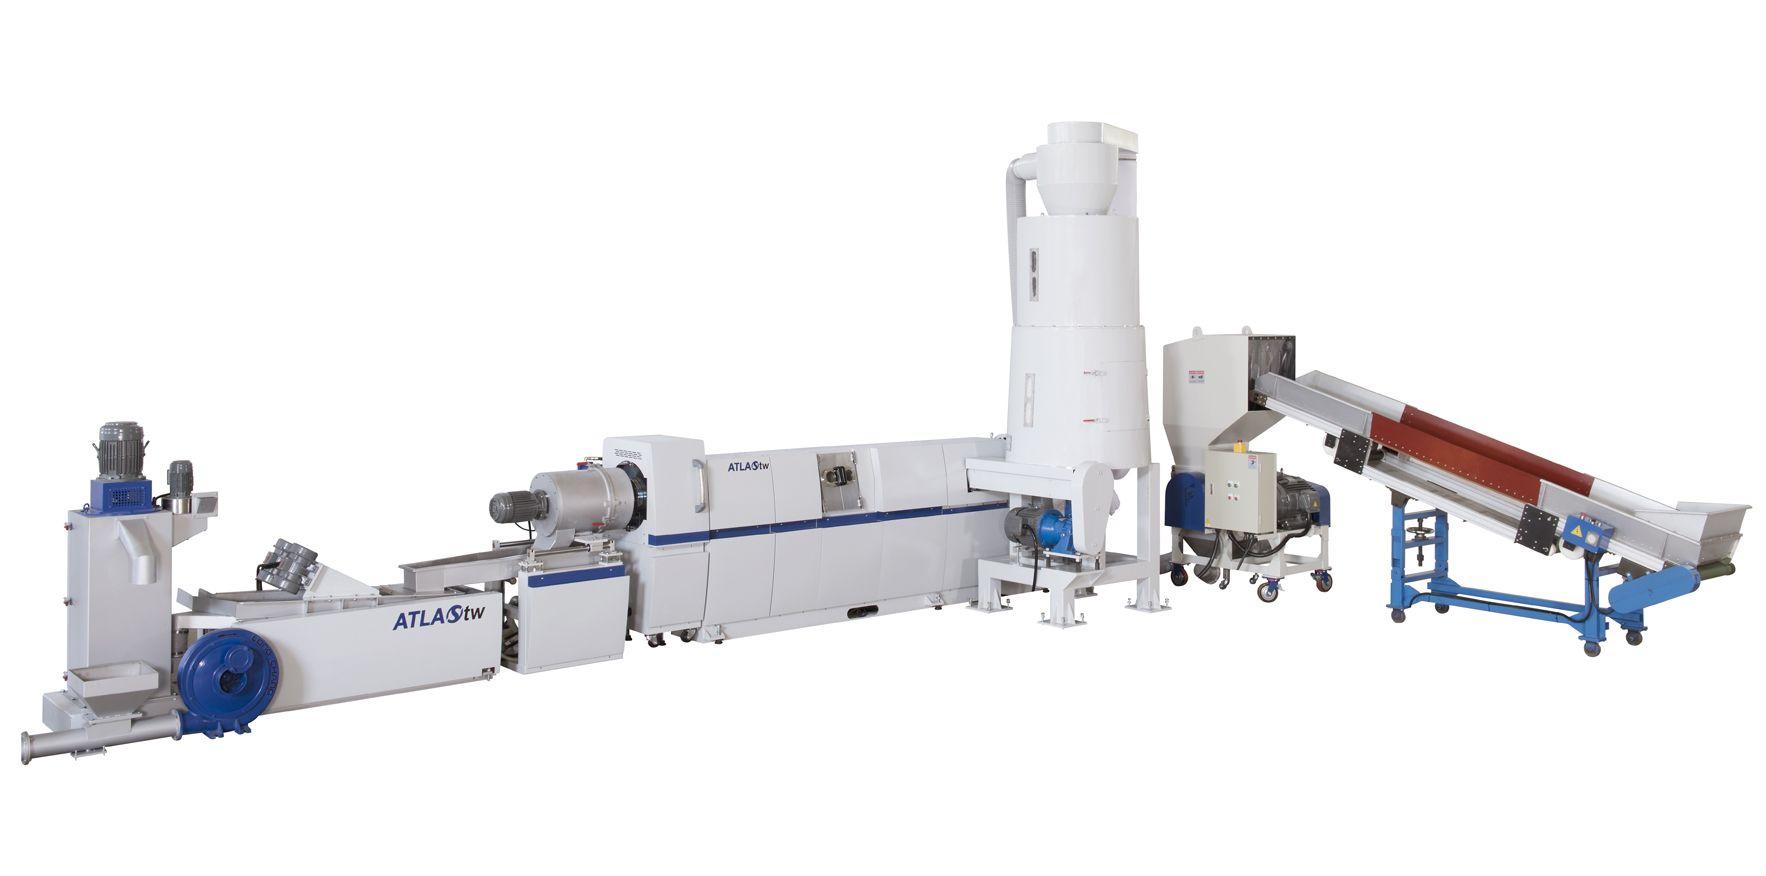 WPF-100 Side Feeding Plastic Recycling & Pelletizing Machine